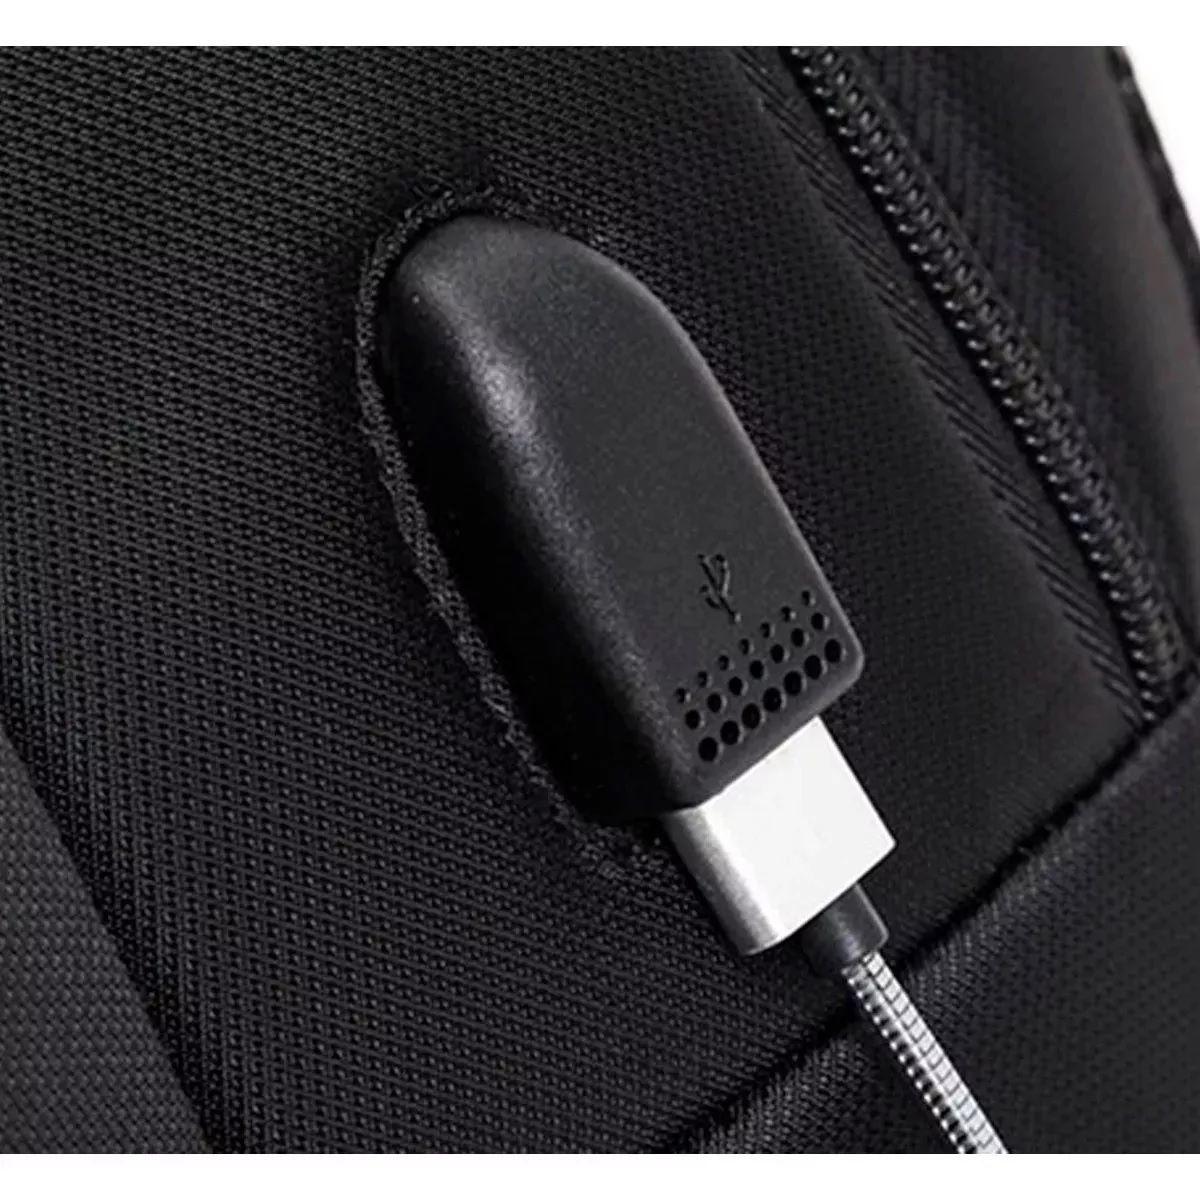 Mochila Notebook USB Masculina Preta Impermeável Resistente